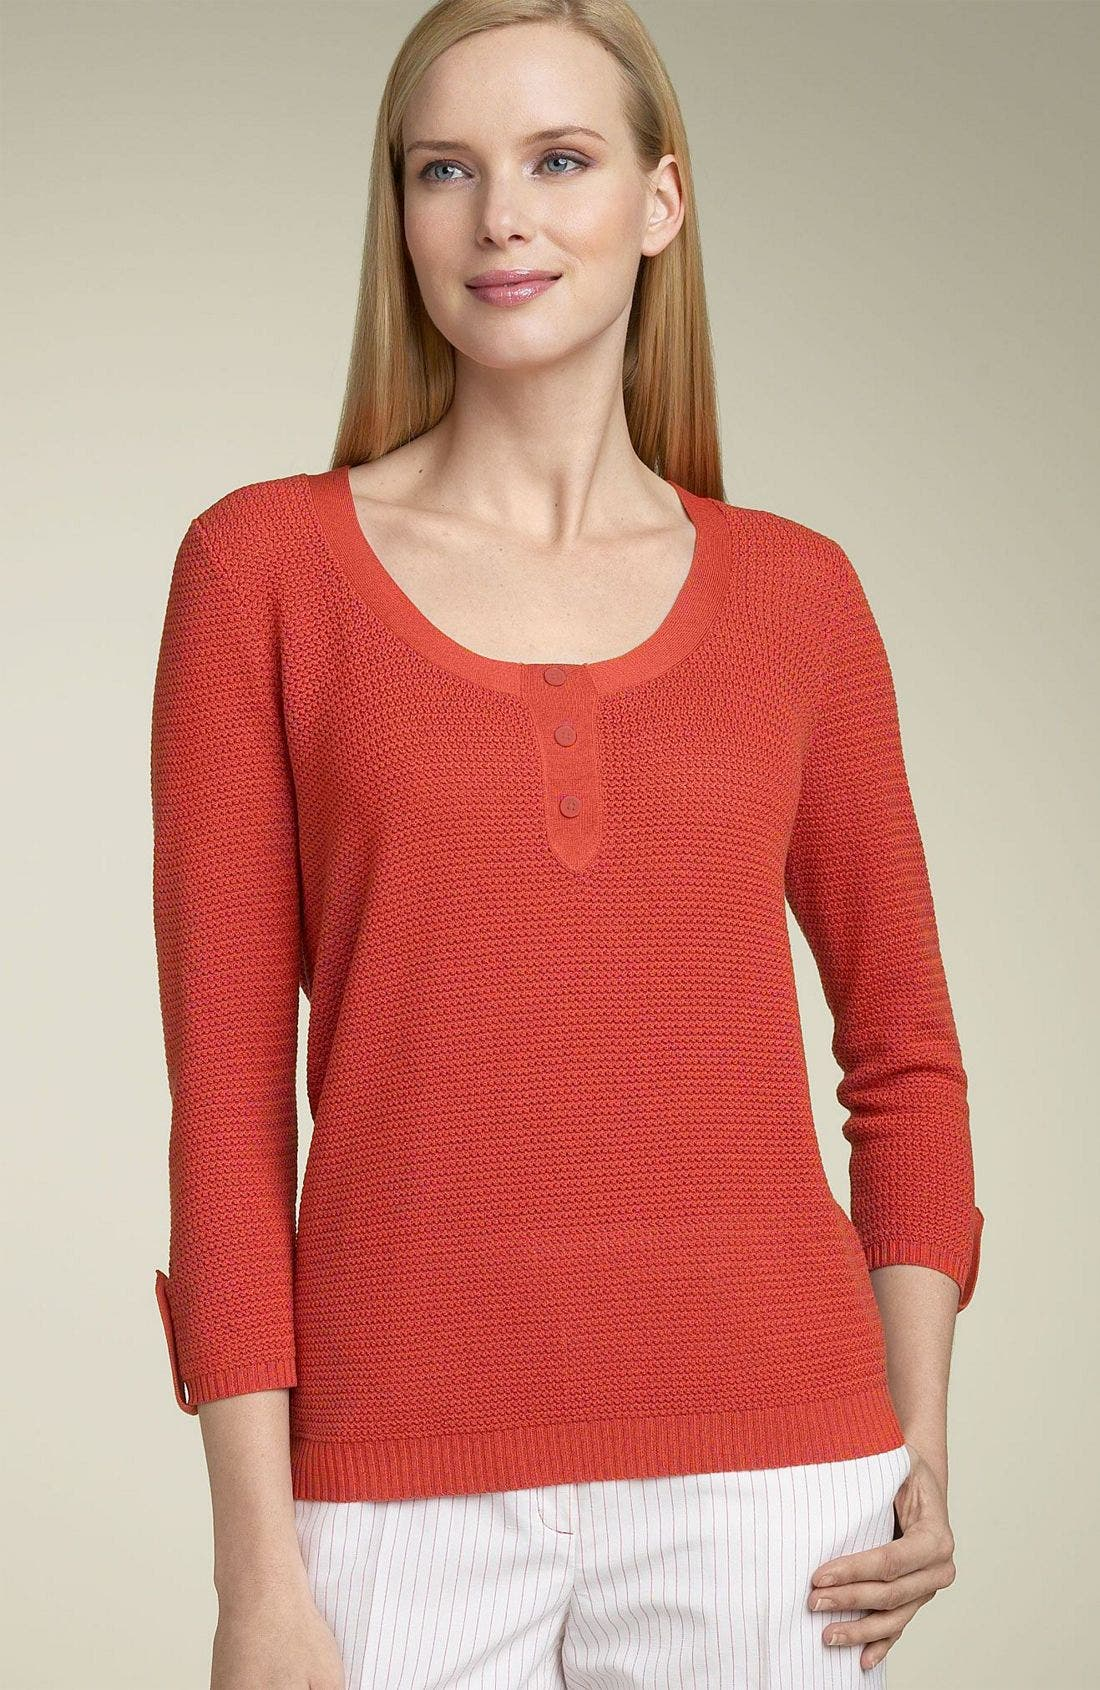 F. FAÇONNABLE Façonnable 'Popcorn' Sweater, Main, color, PPA